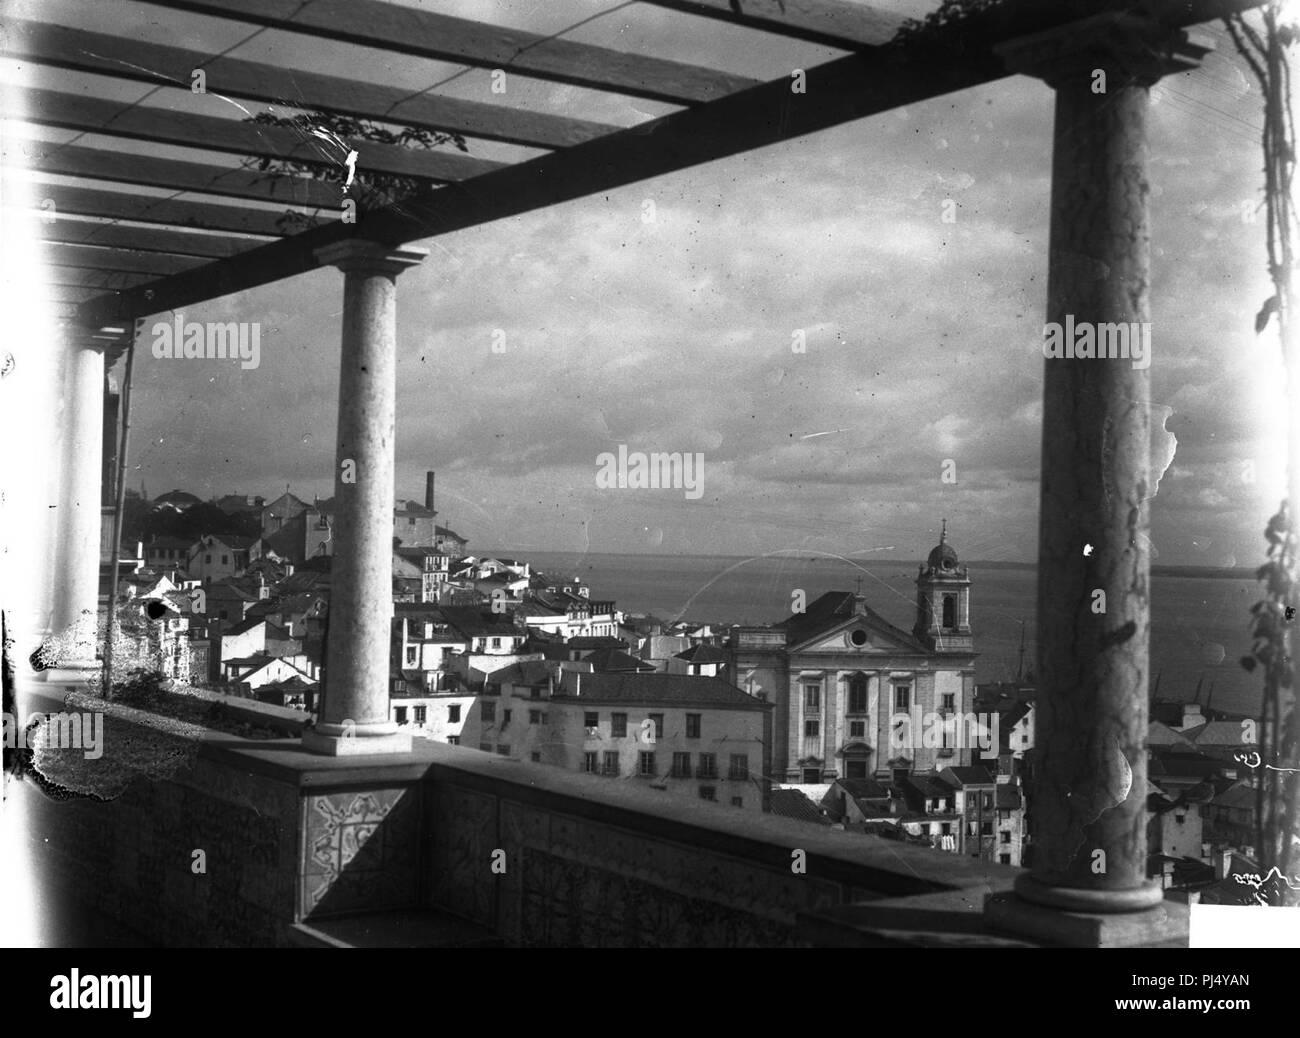 BAR000308 - Panorâmica de Alfama tirada a partir do miradouro de Santa Luzia. - Stock Image